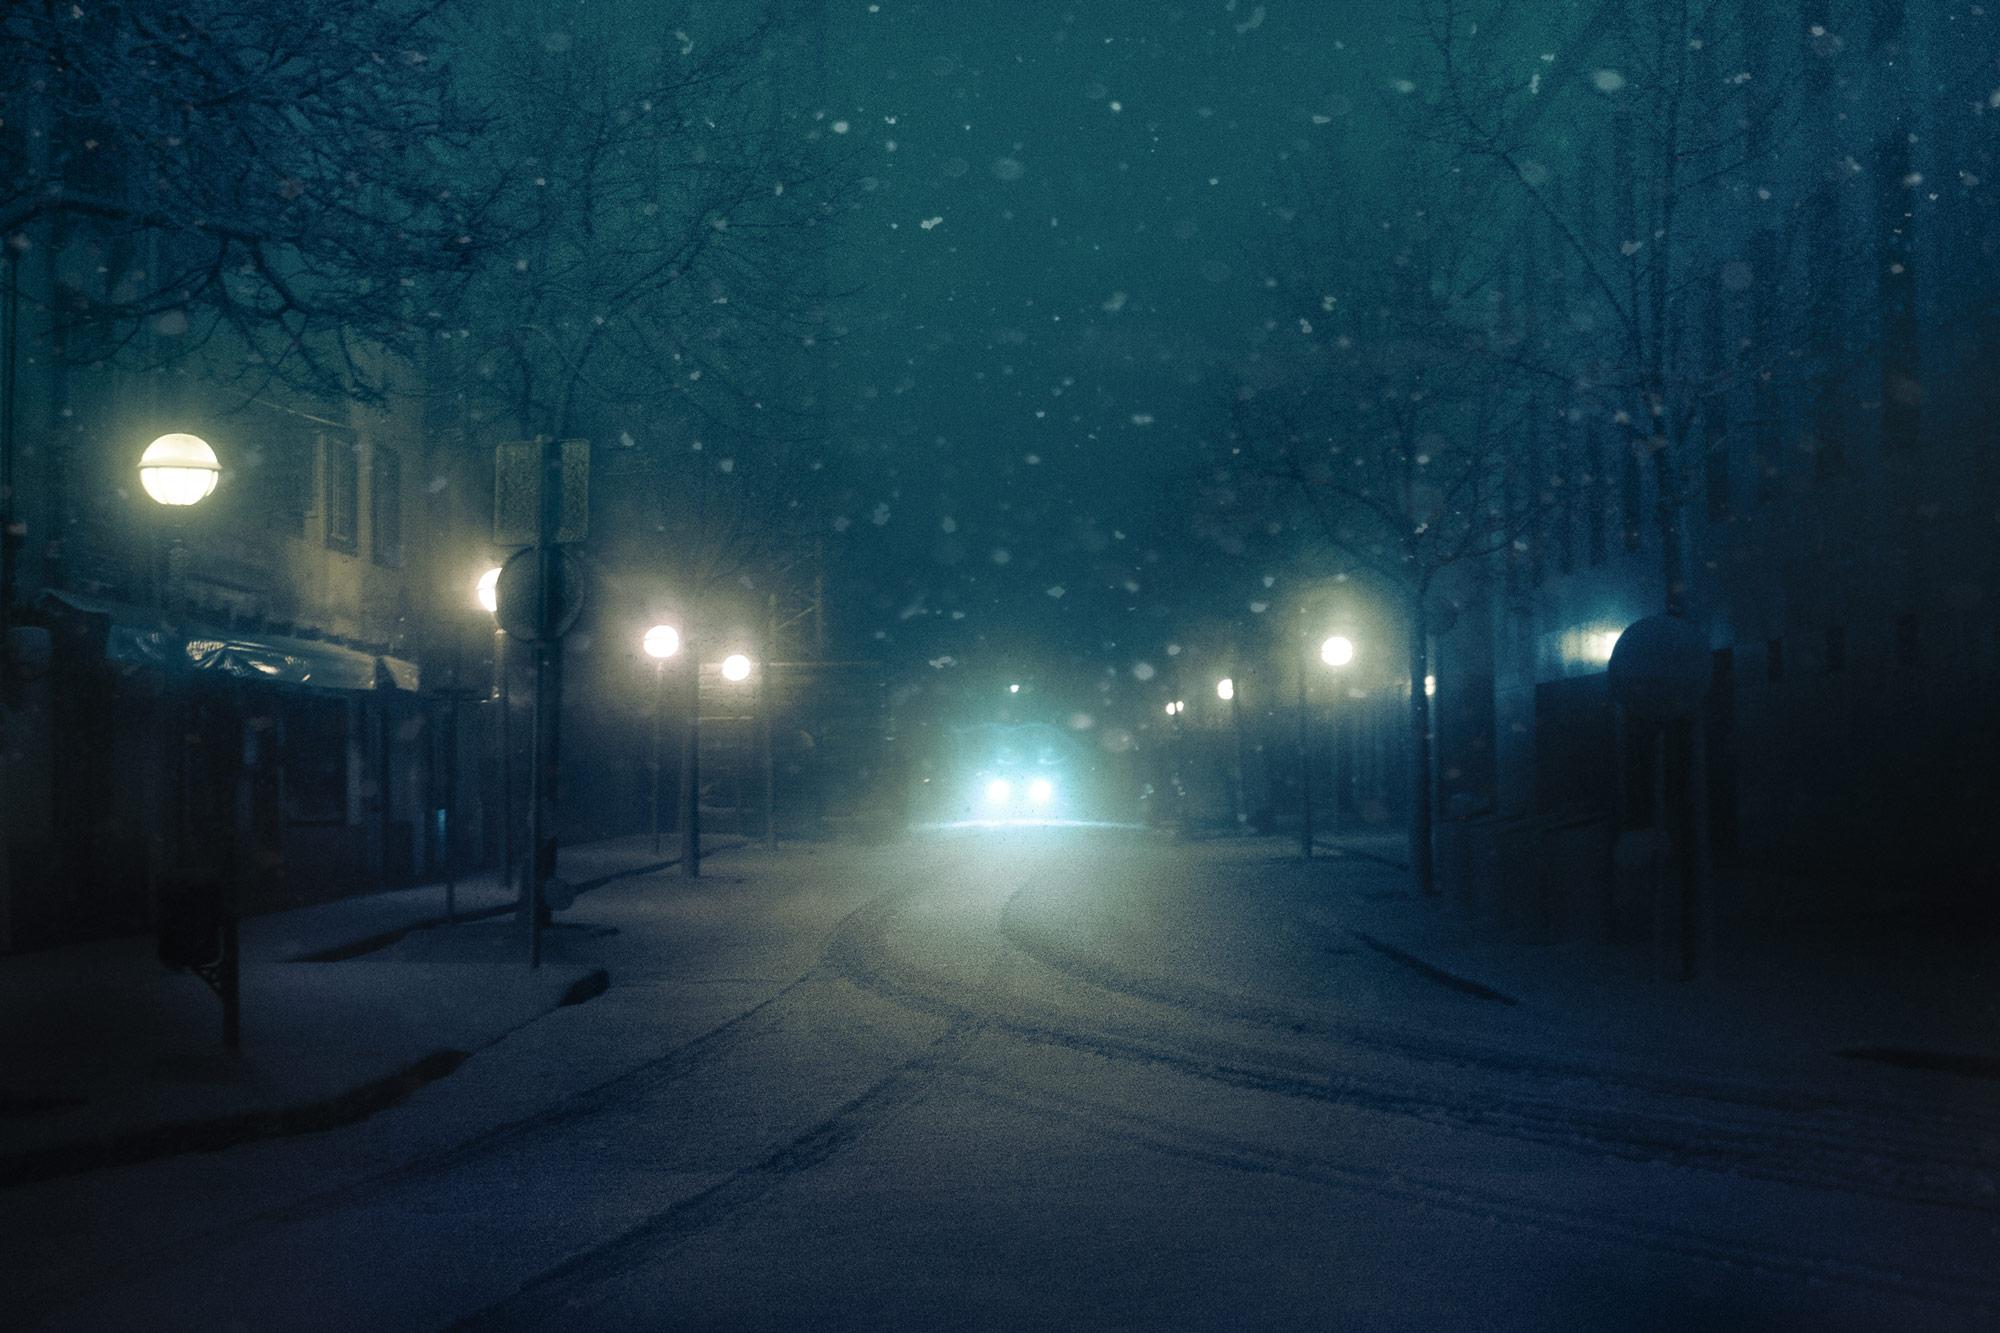 Headlights Cut Through Dense Fog In Moody Images Of Cars At Night By Custom Night Stroll Tao Tajima